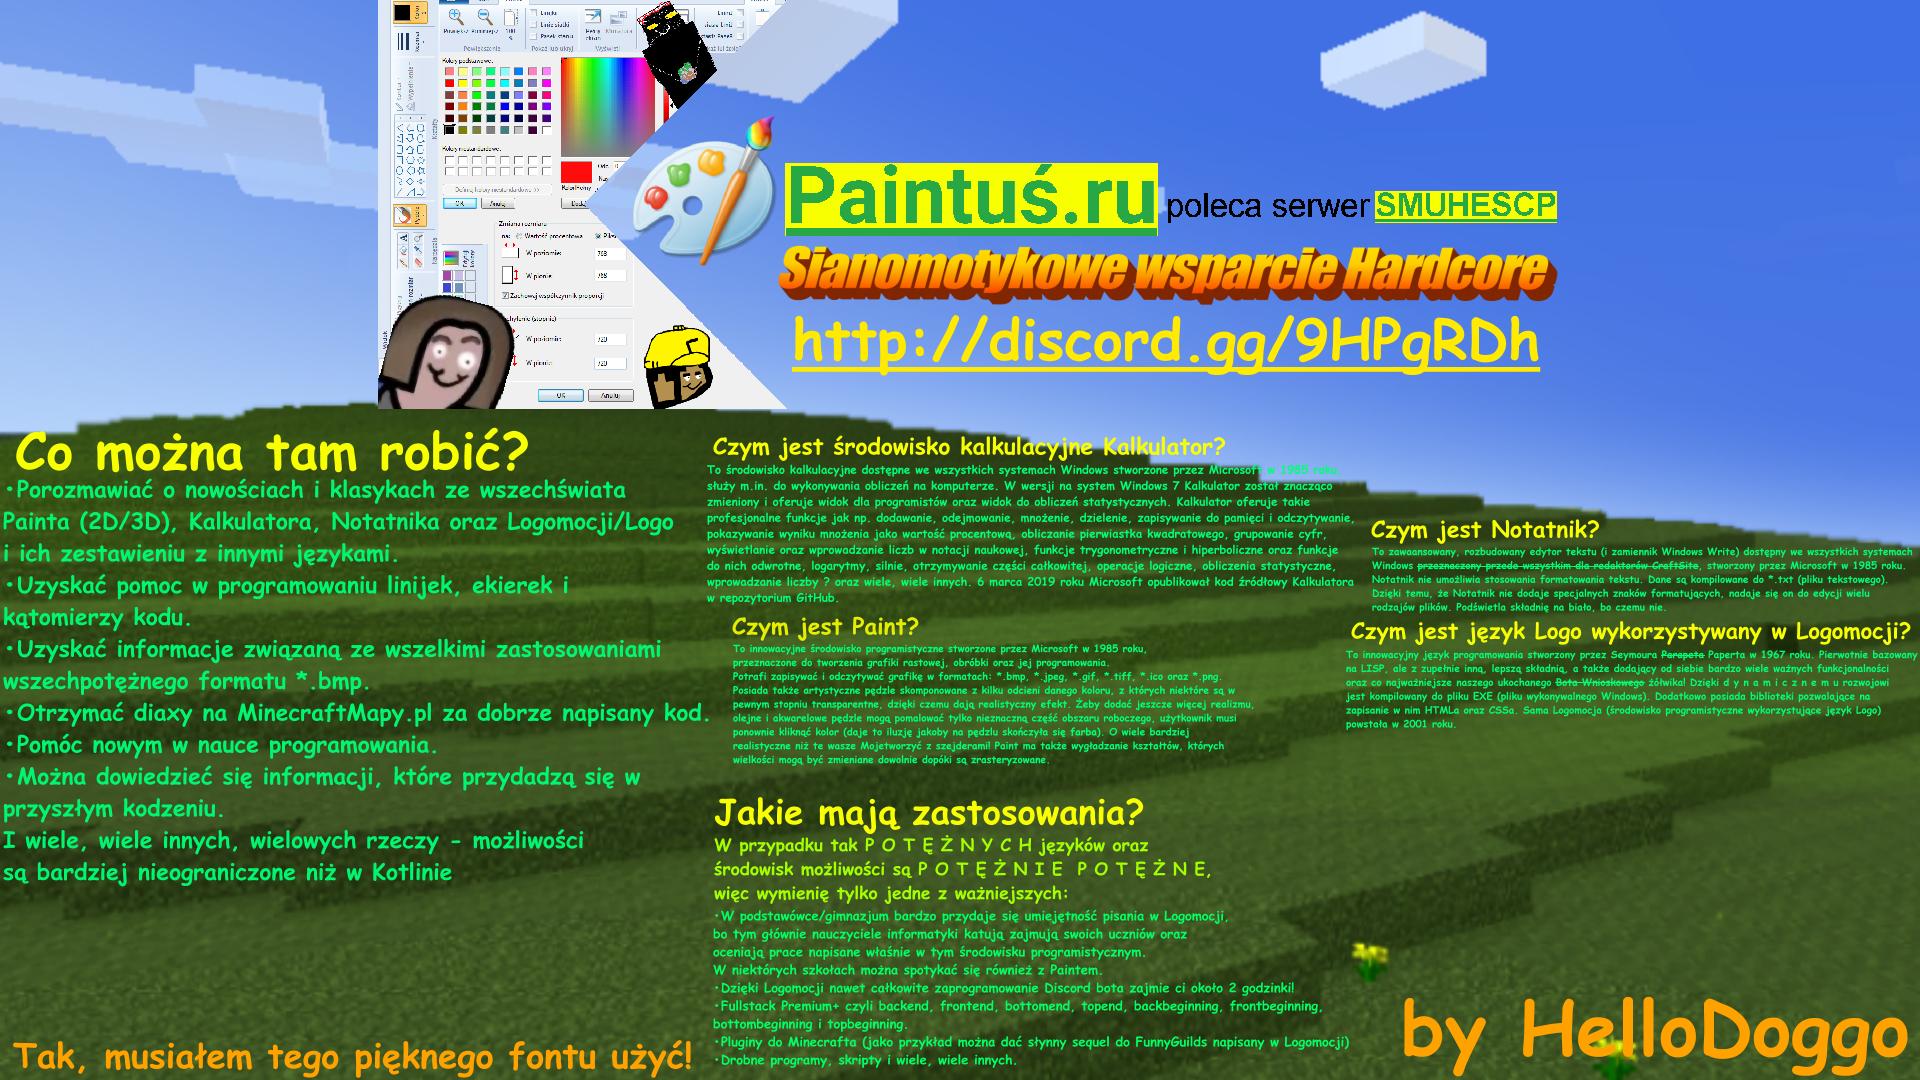 paintusreklama.png